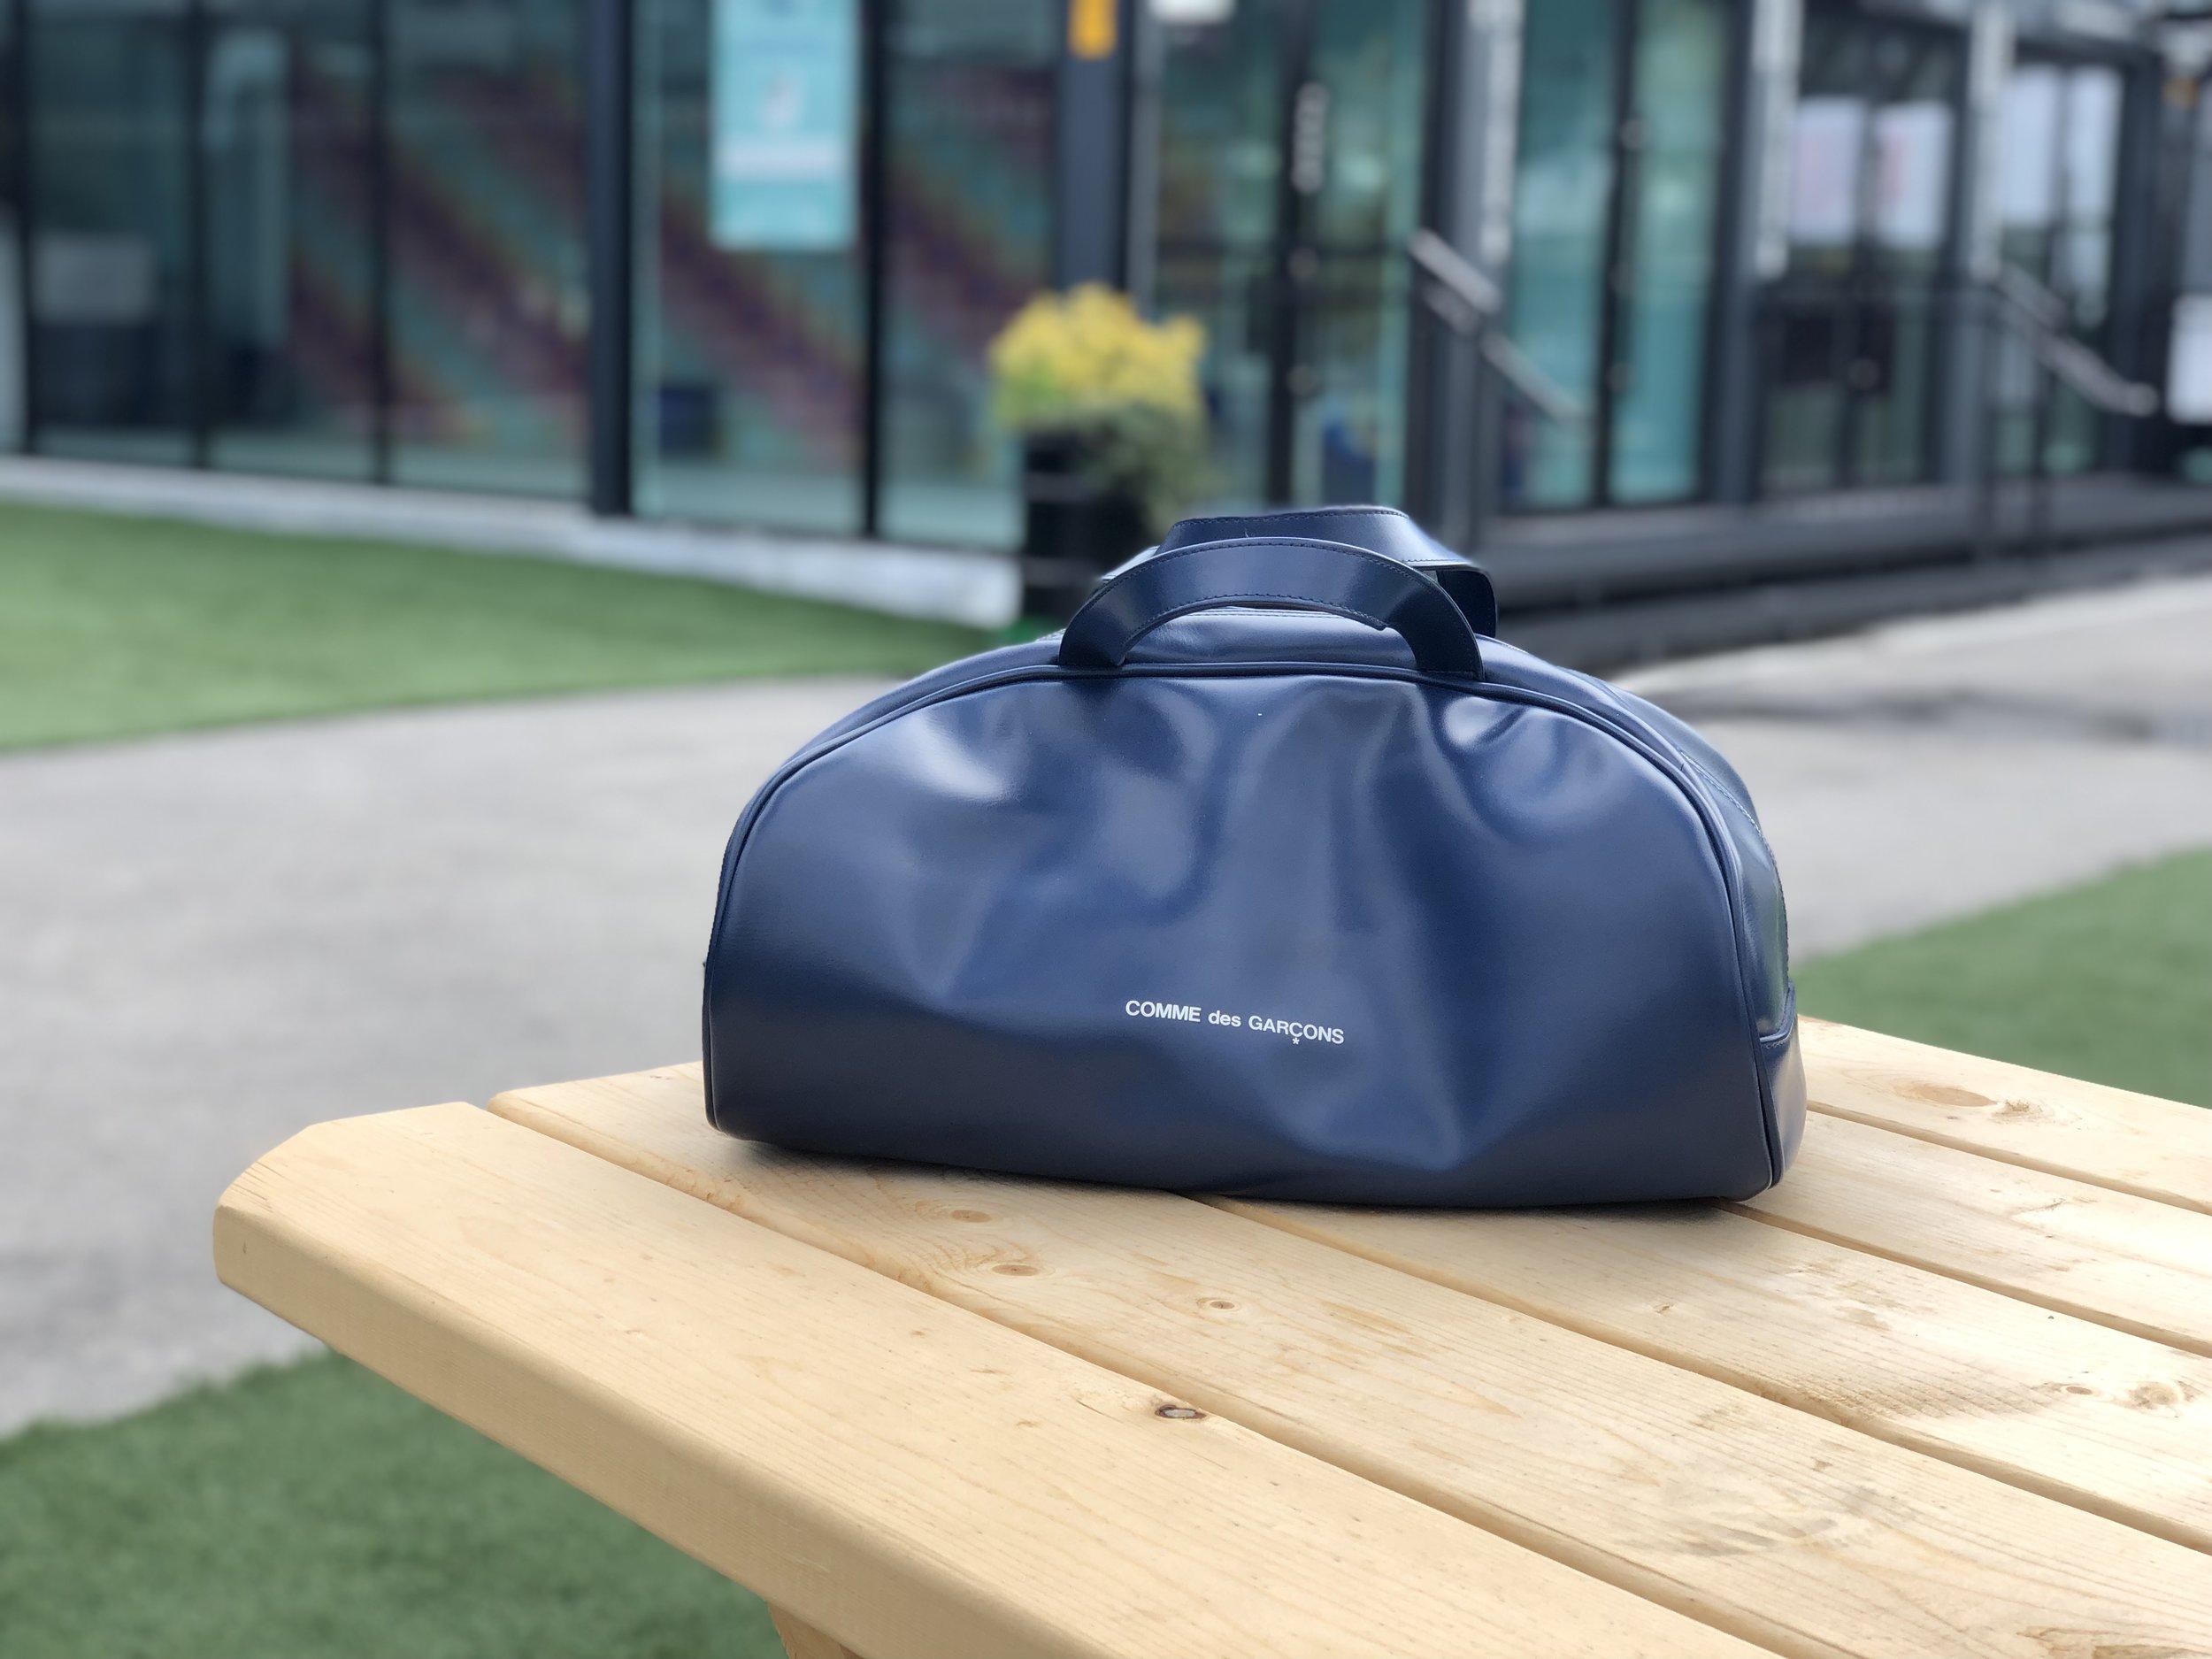 FEATURED: COMME des GARÇONS Blue Bowling Bag Style Carry-On